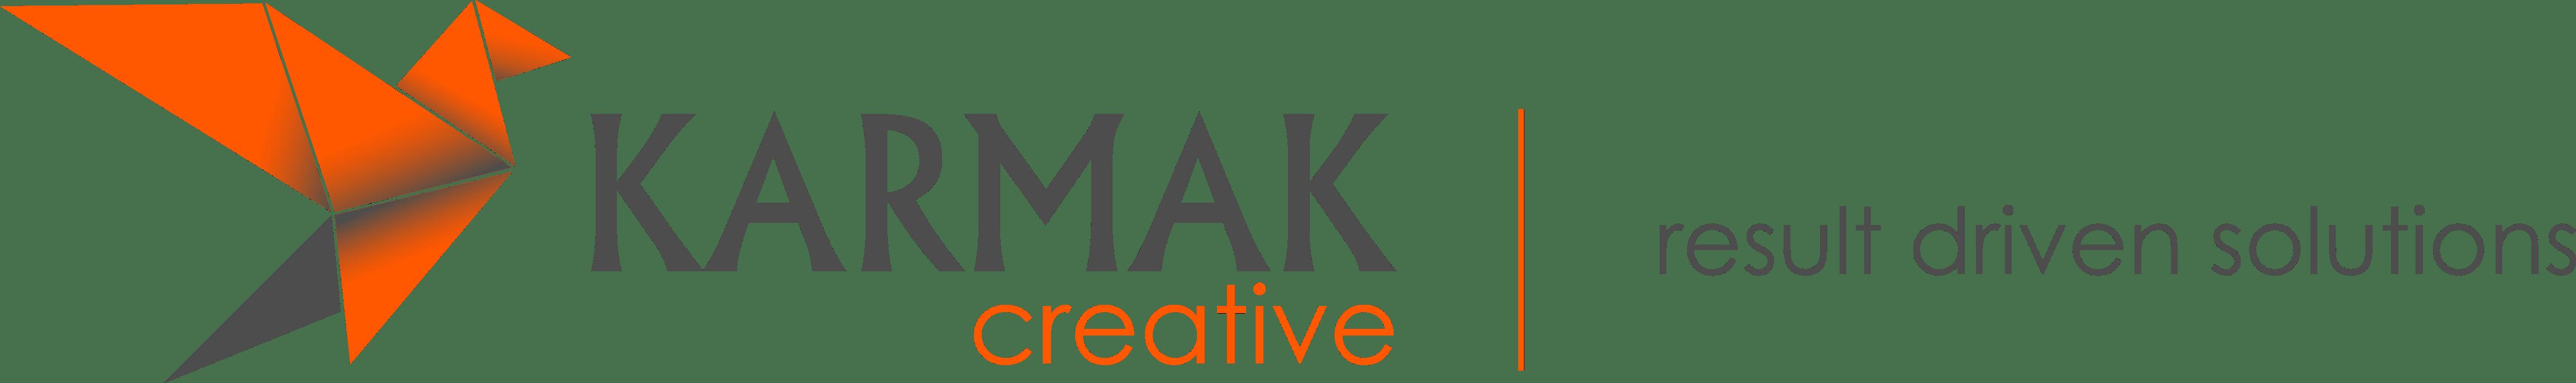 Karmak Creative